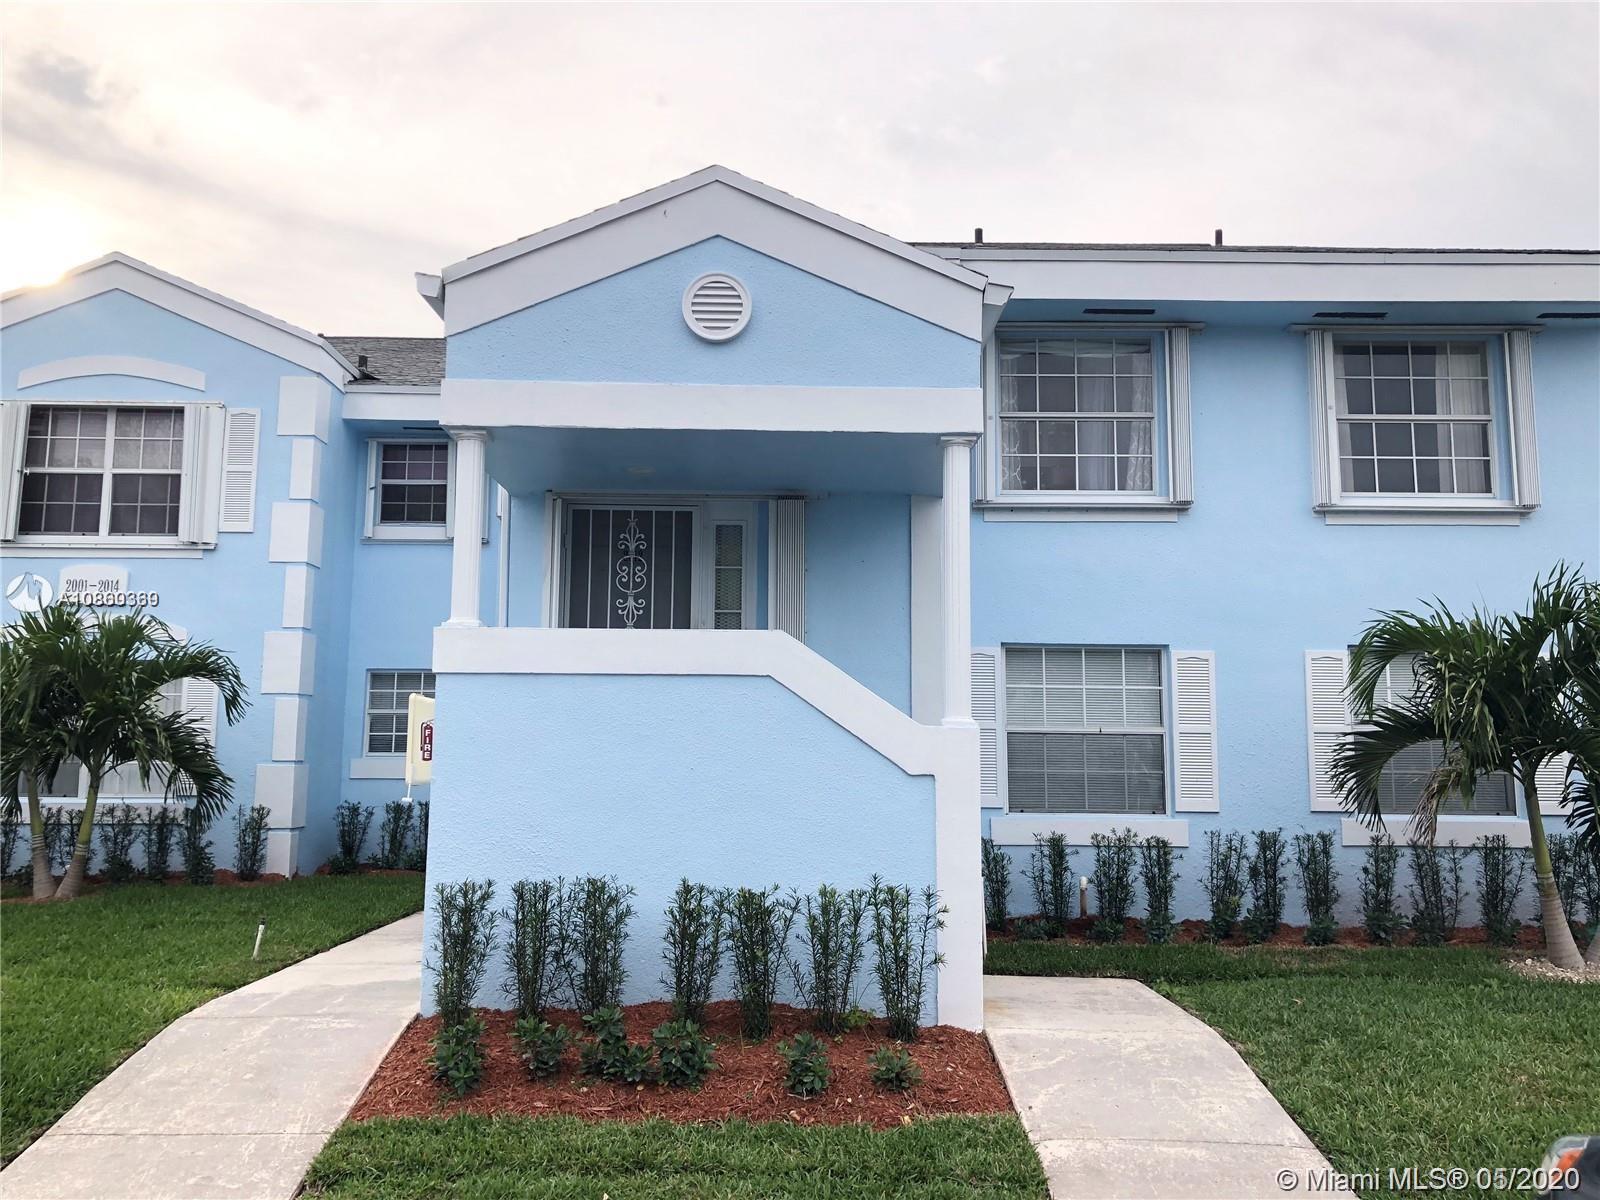 2012 SE 26th Ln #206, Homestead, FL 33035 - Homestead, FL real estate listing